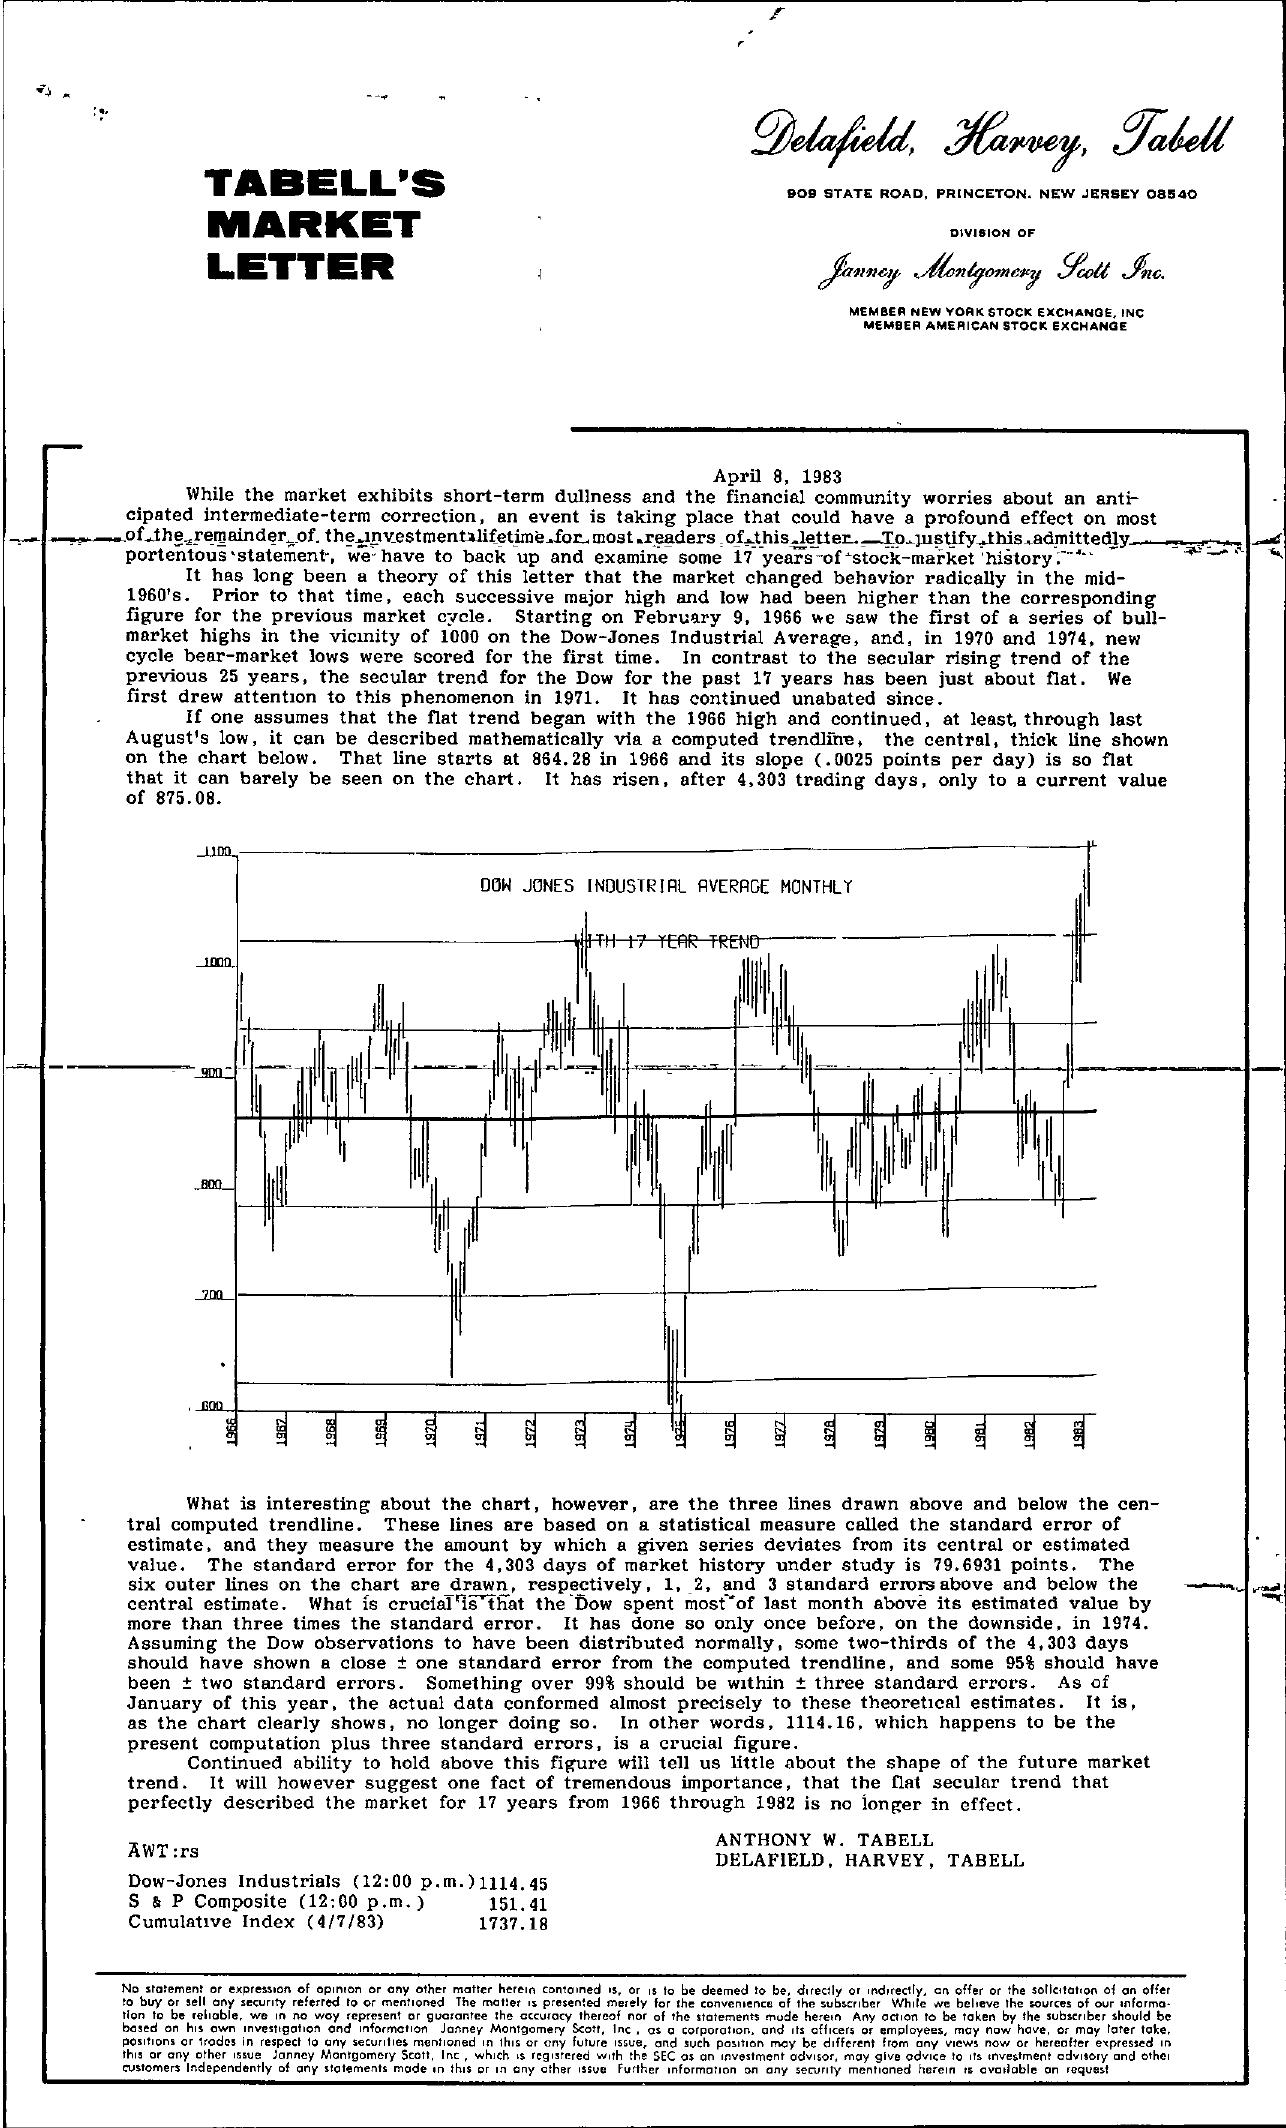 Tabell's Market Letter - April 08, 1983